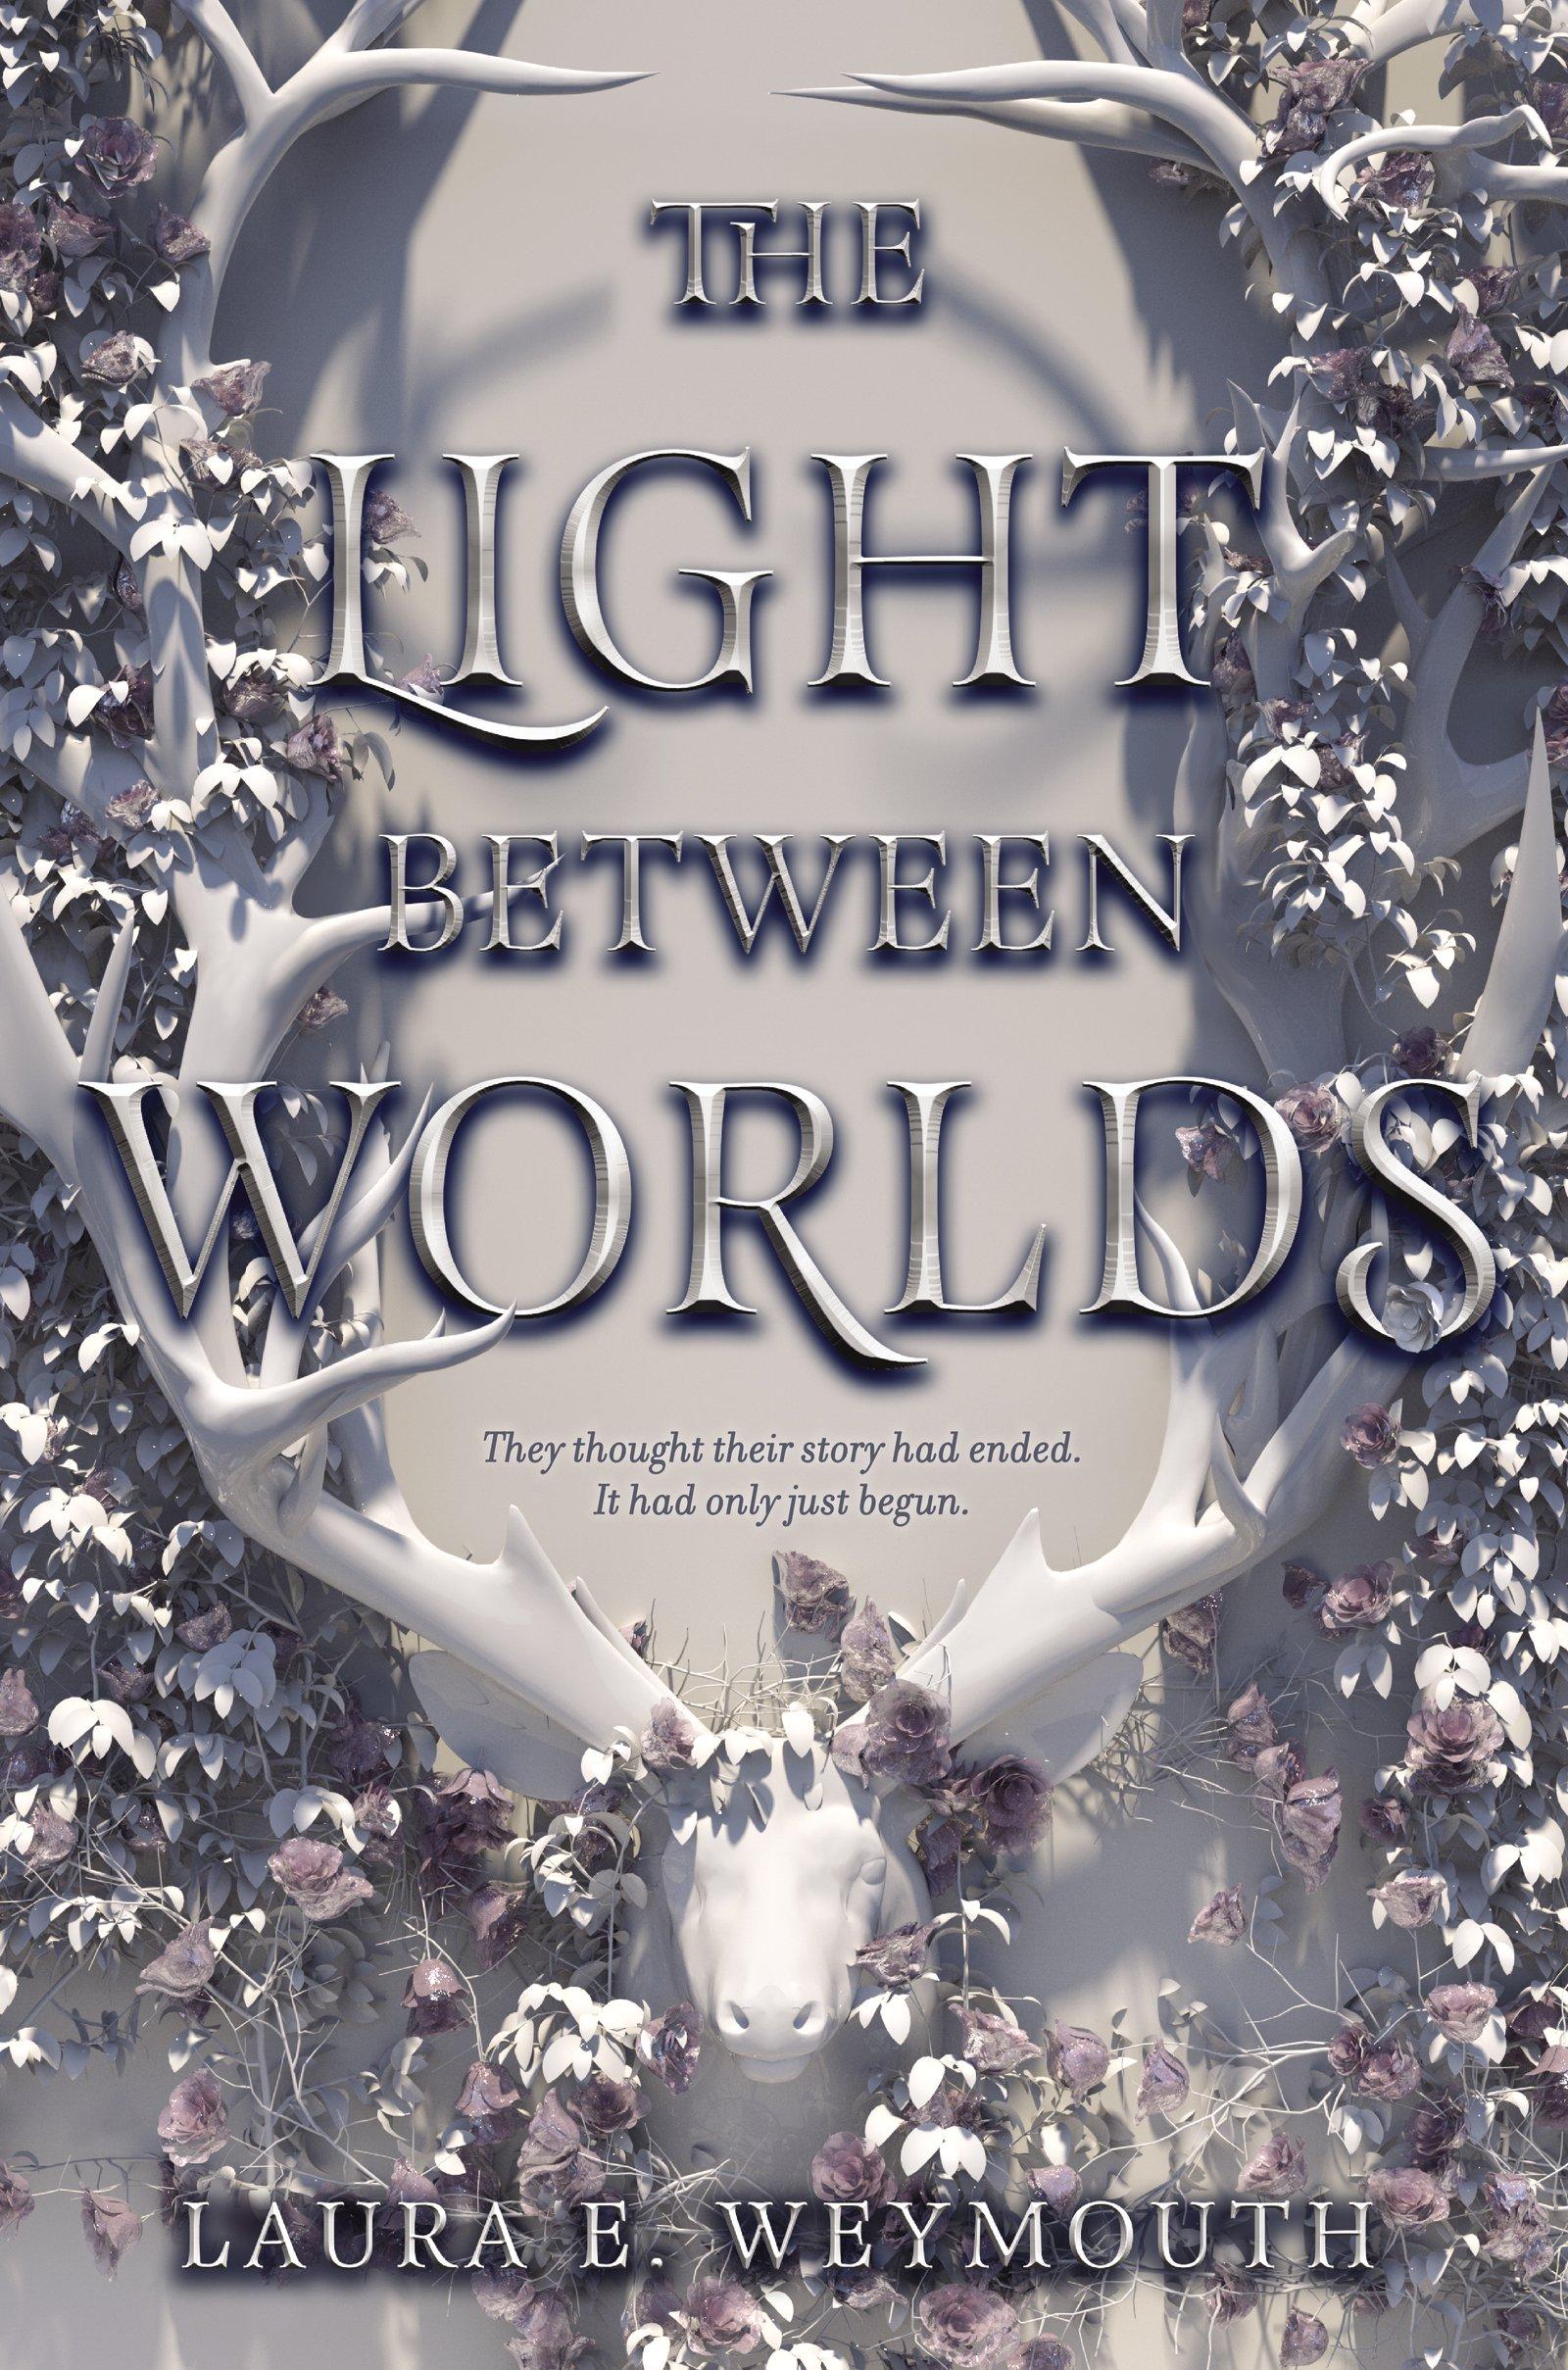 Amazon.com: The Light Between Worlds: 9780062696878: Weymouth, Laura E:  Books